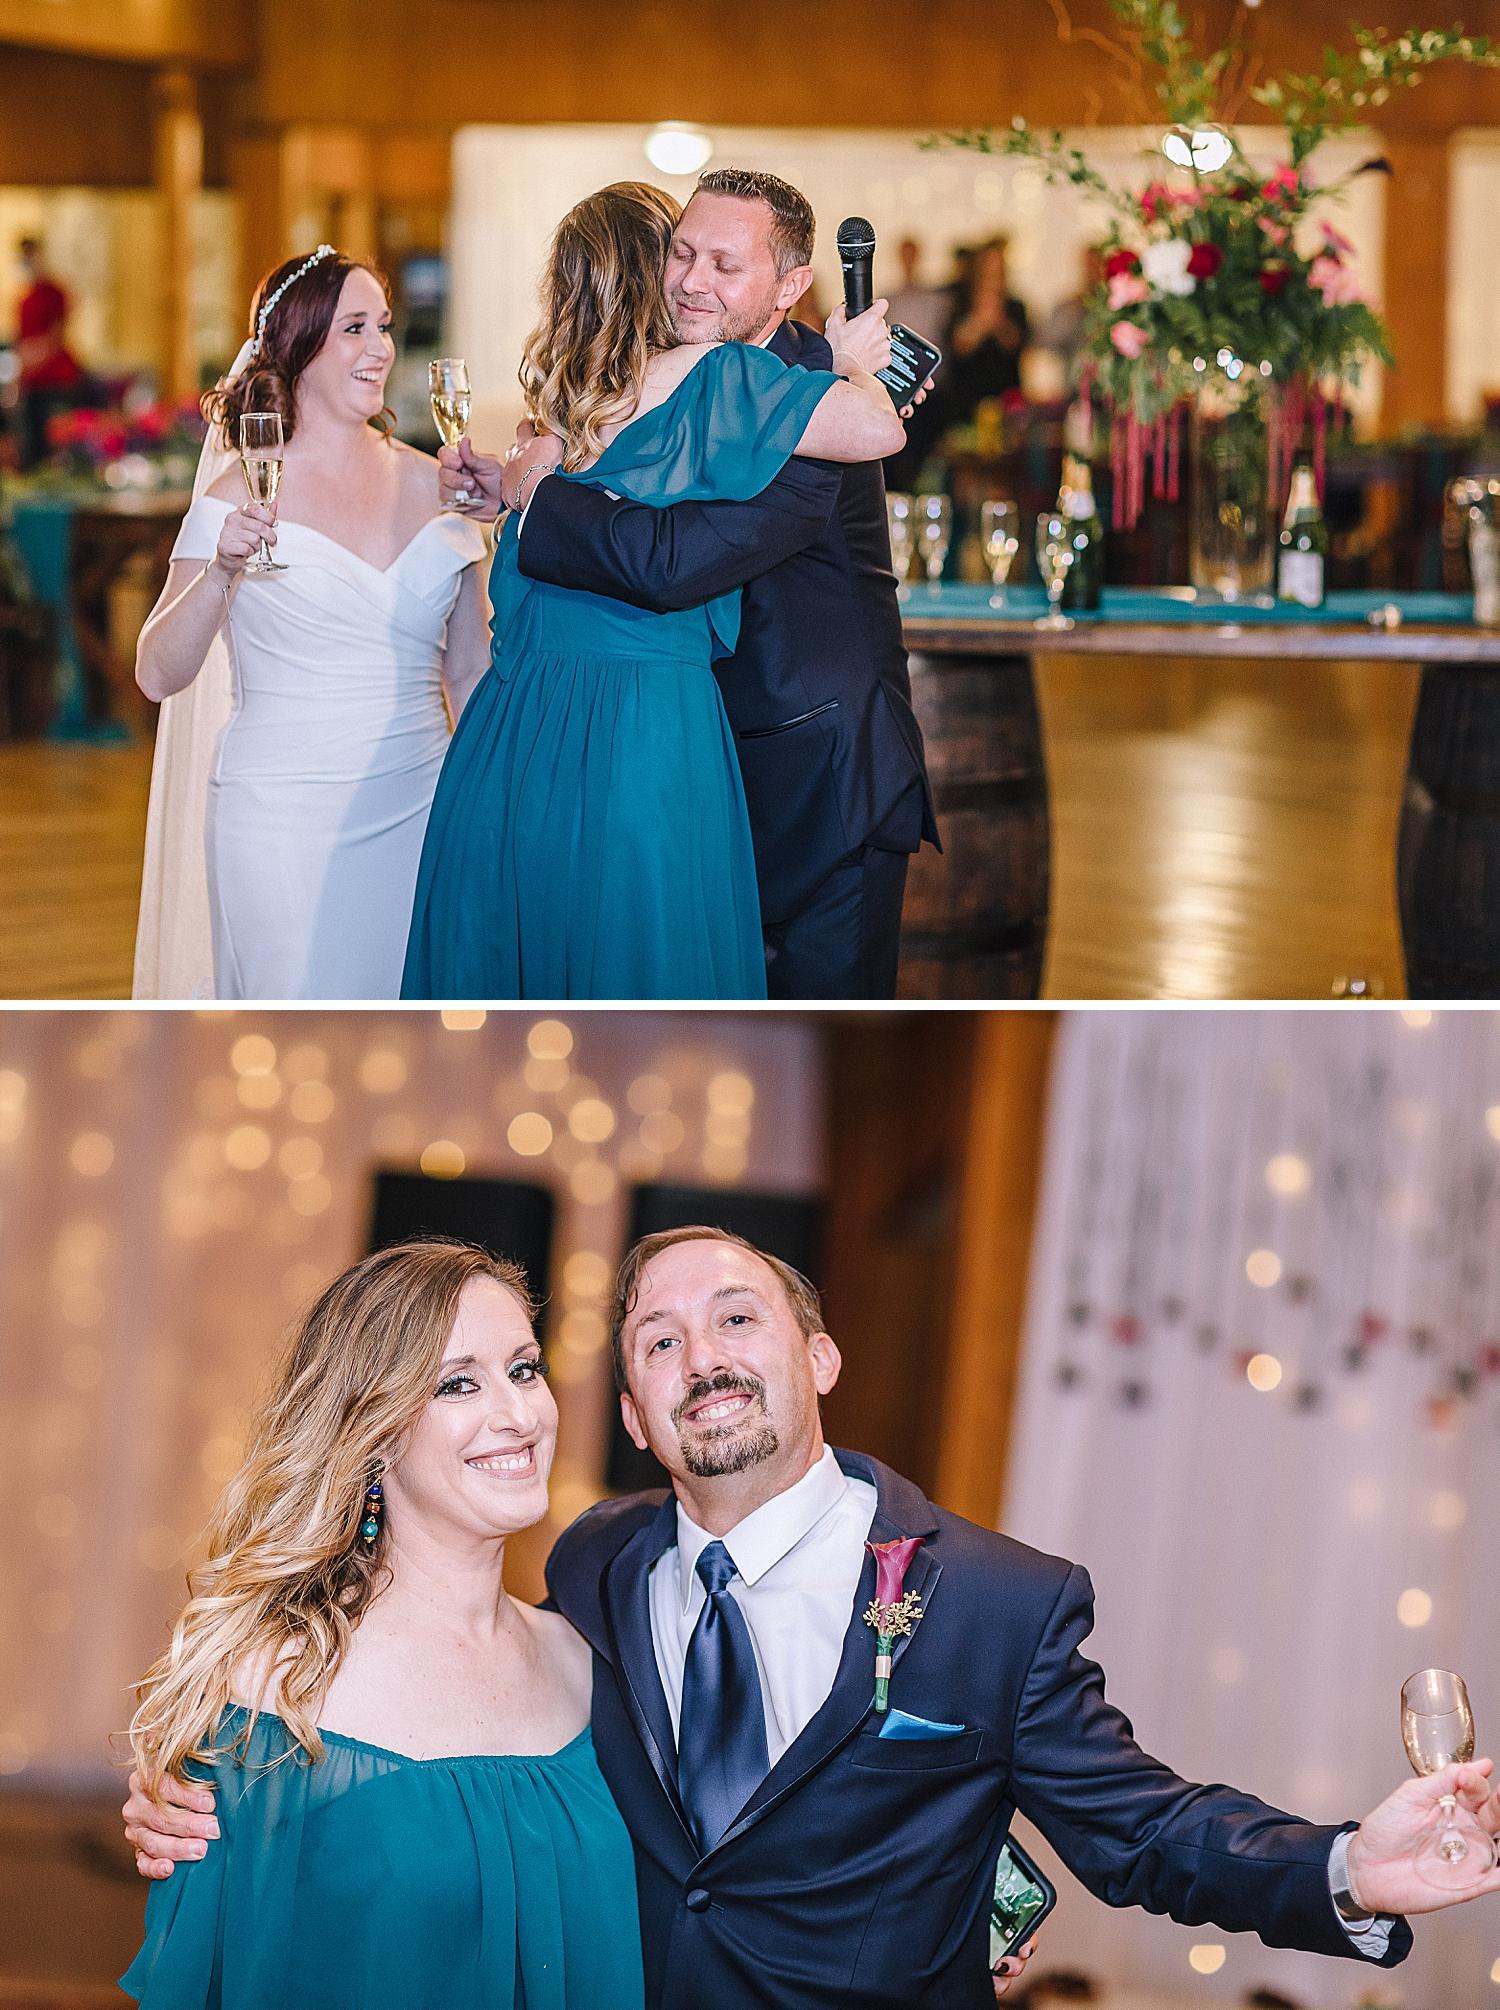 Jewel-Tone-Texas-Wedding-Valerie-Jason-Carly-Barton-Photography_0088.jpg